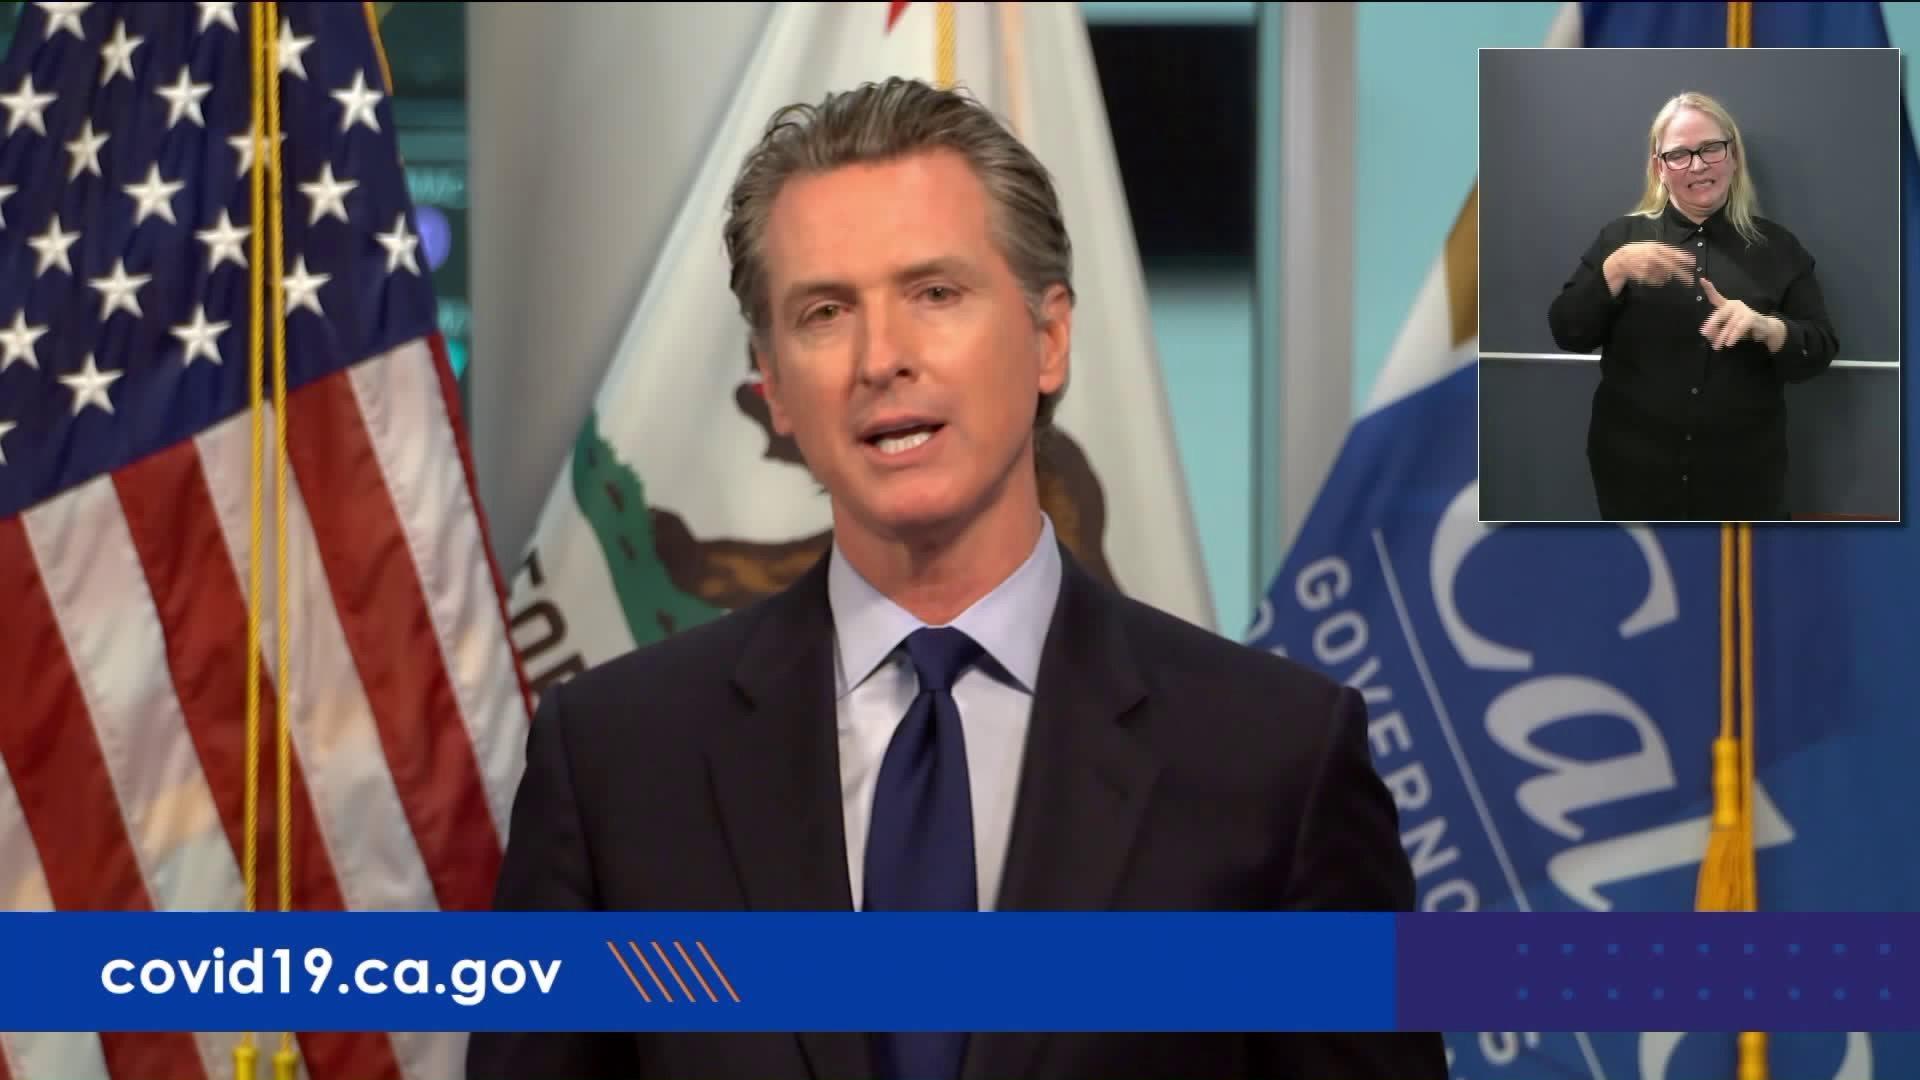 Gov. Gavin Newsom speaks at a news briefing on May 1, 2020.